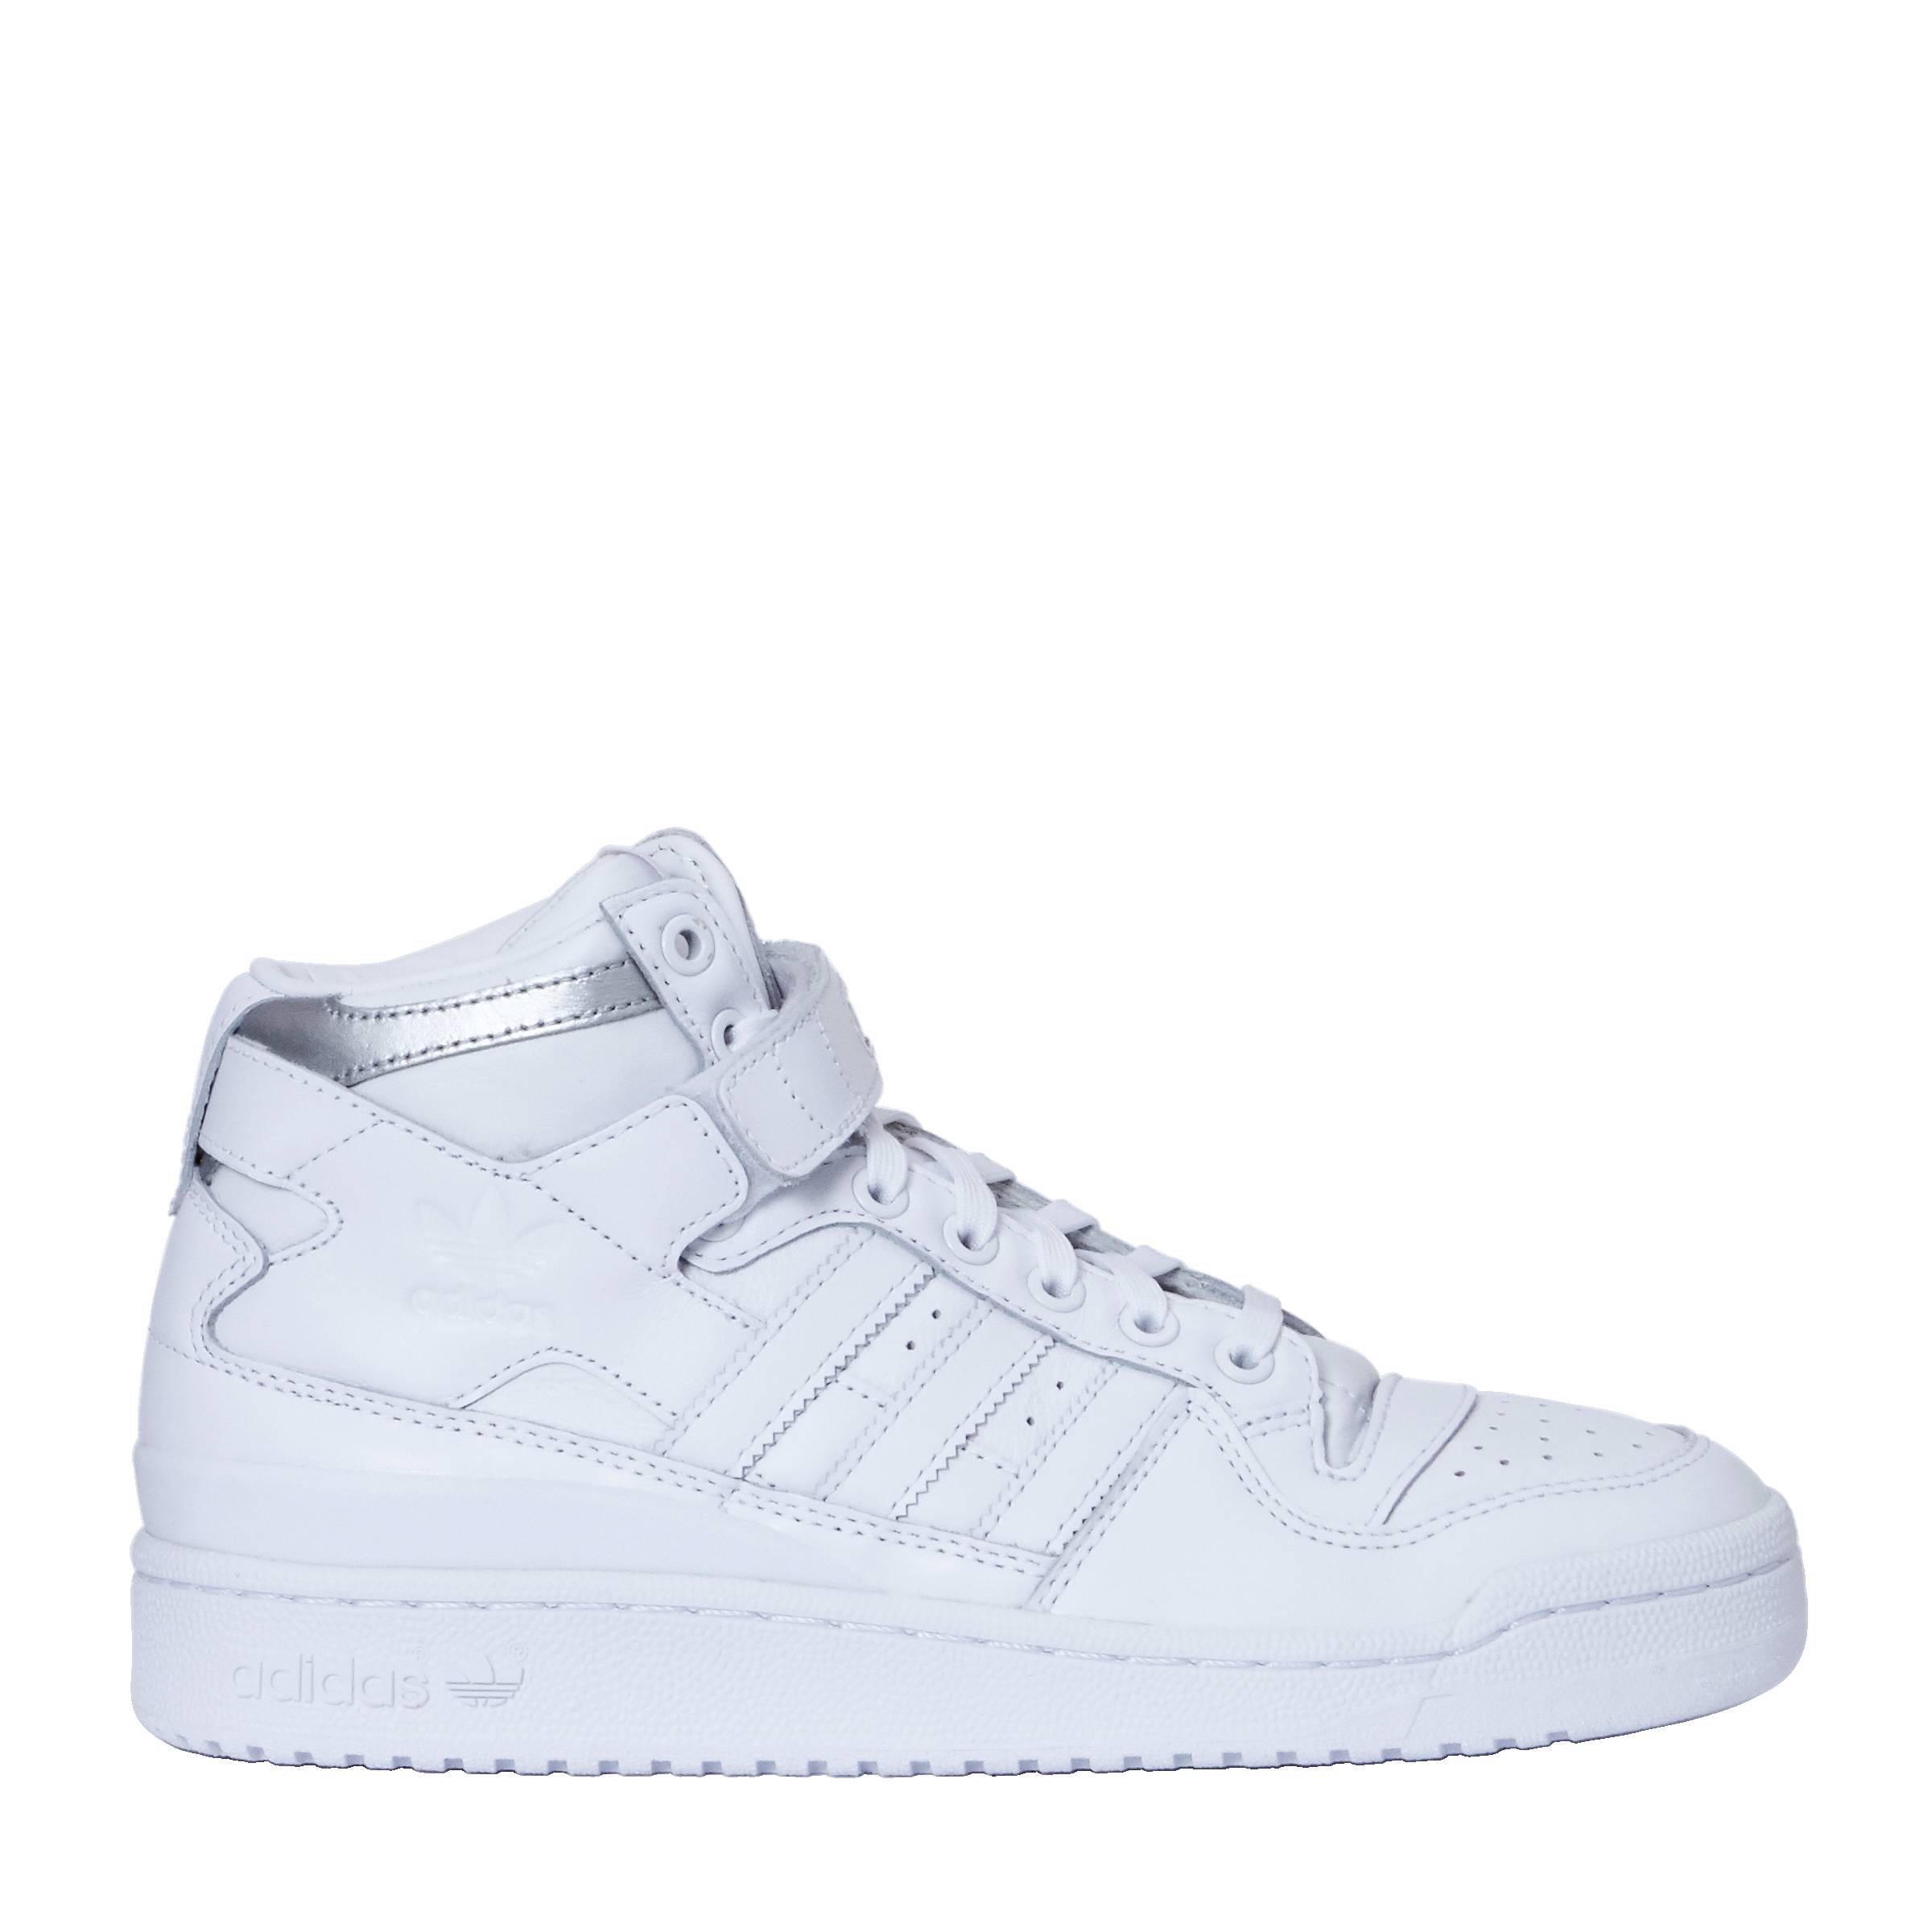 separation shoes 34bf8 485e5 adidas originals Forum Mid Refined leren sneakers  wehkamp